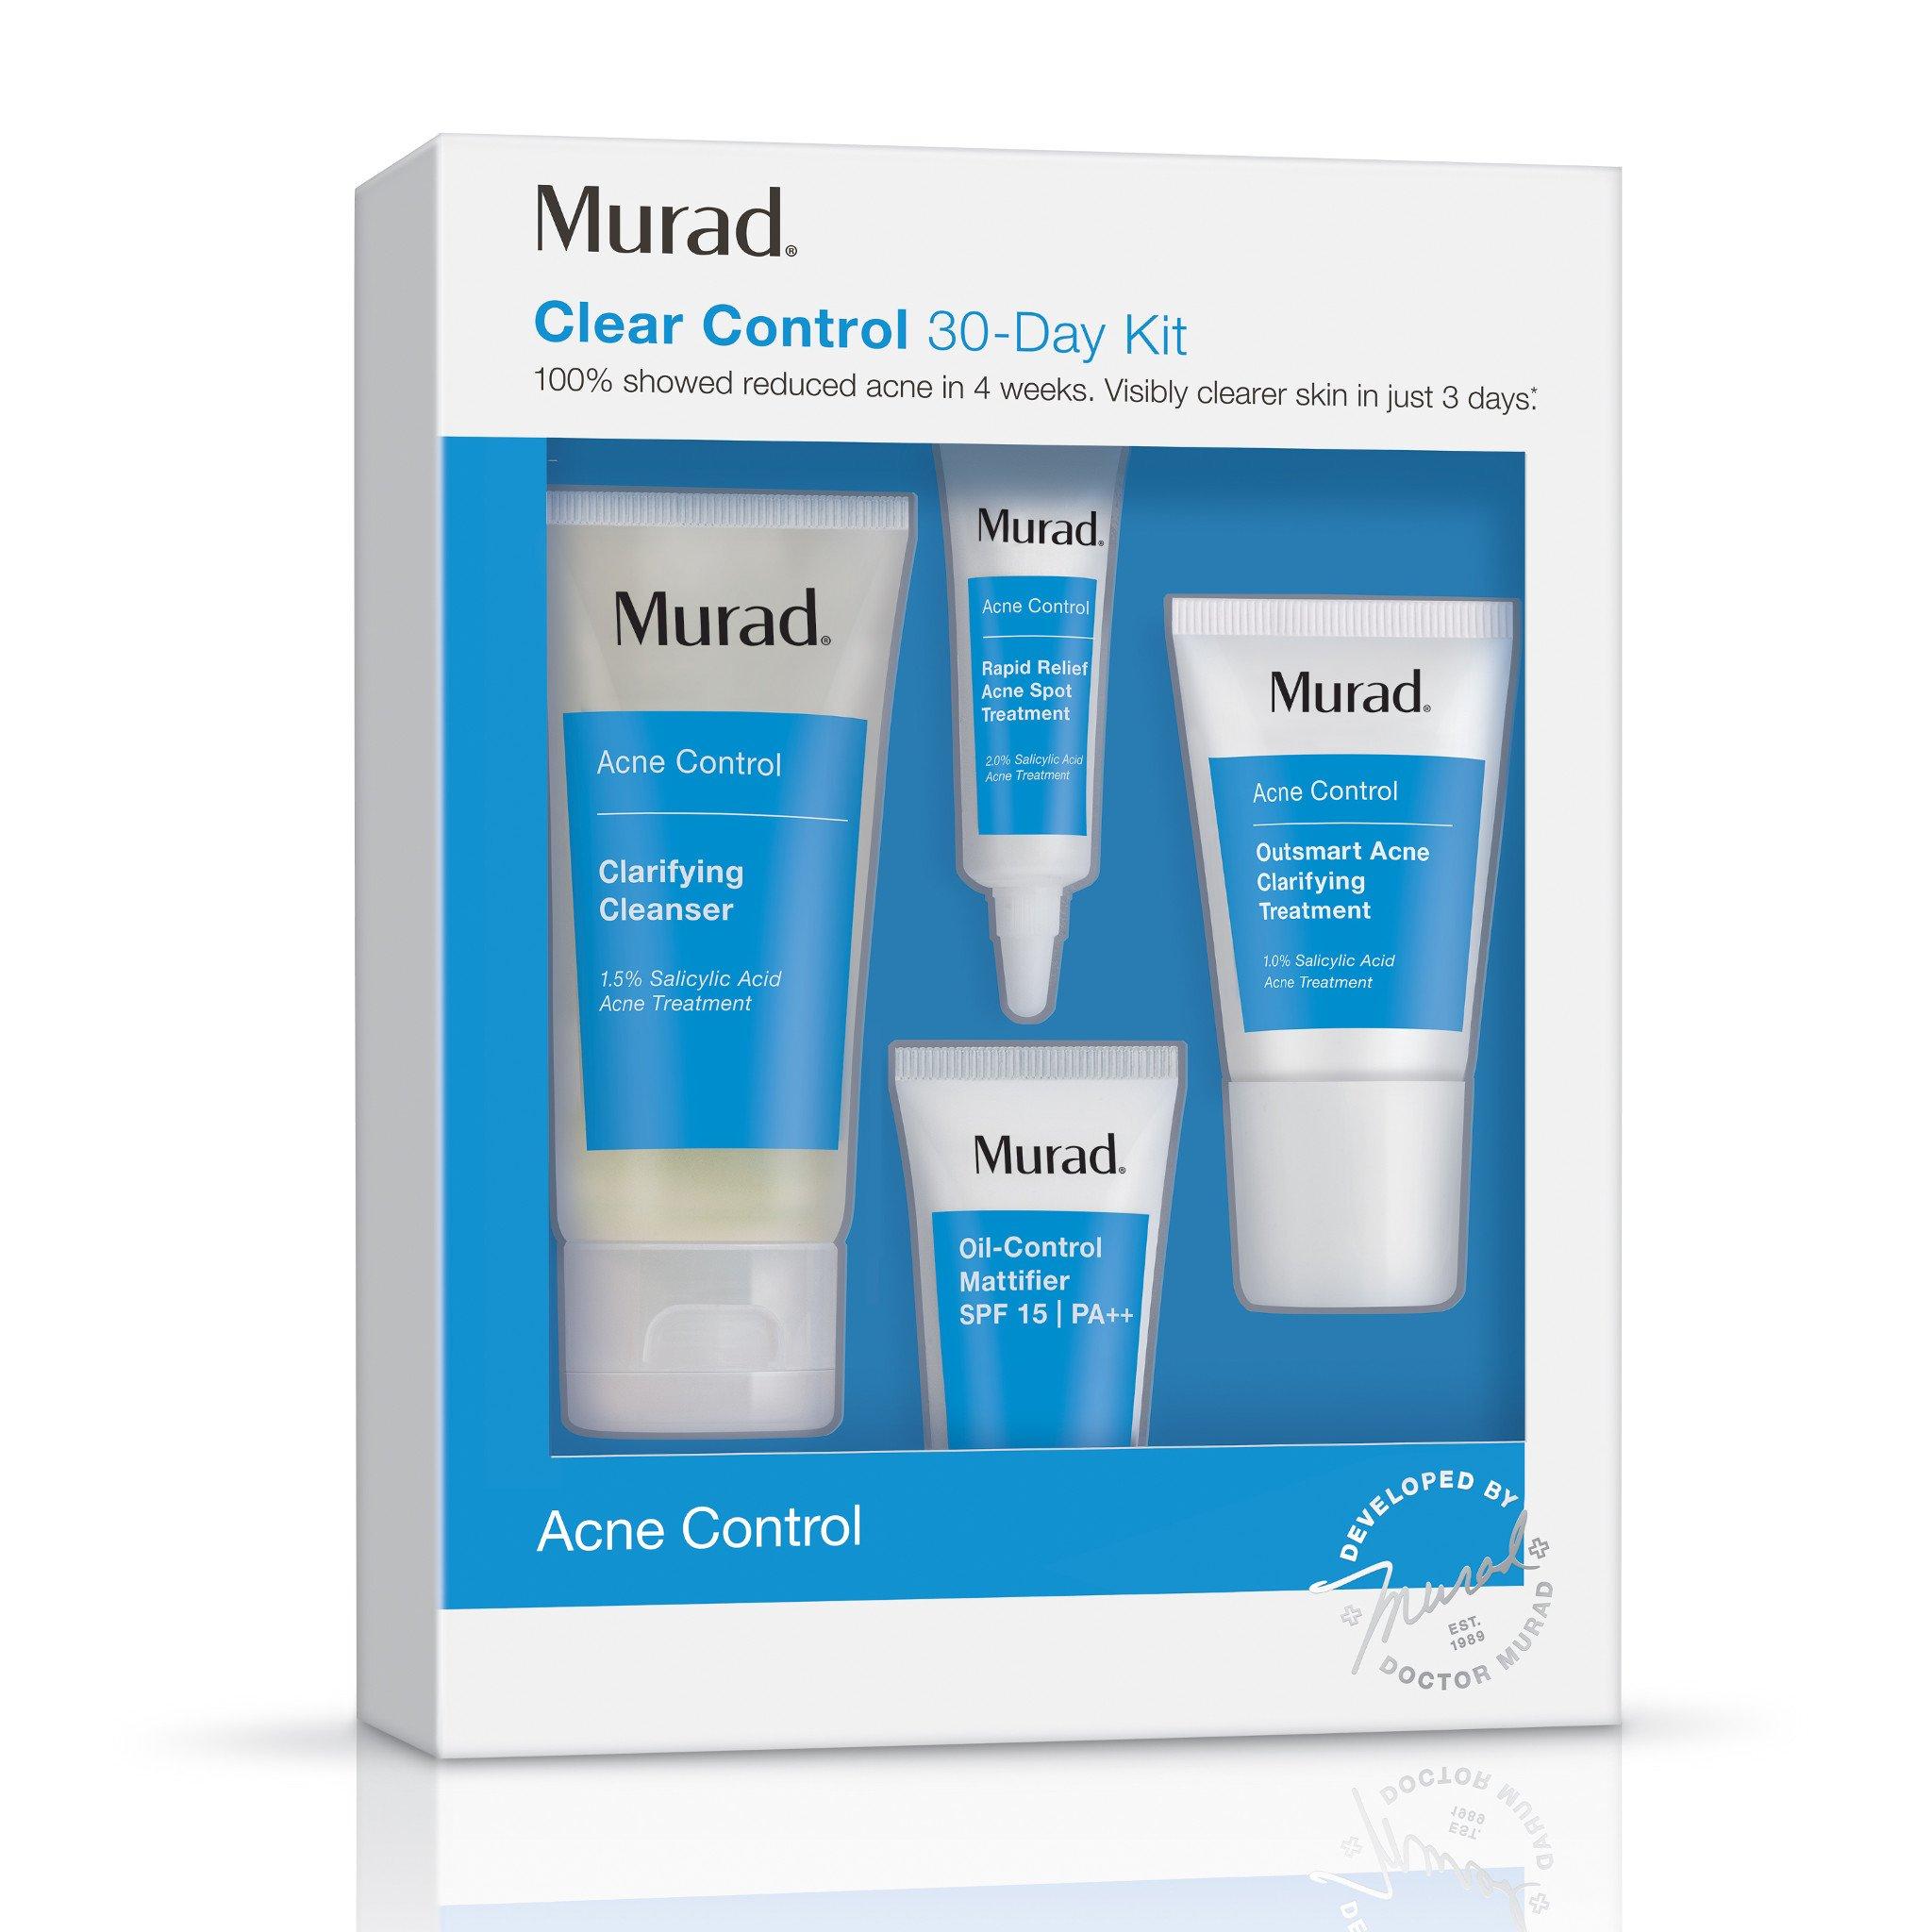 Murad Clear Control Acne Kit